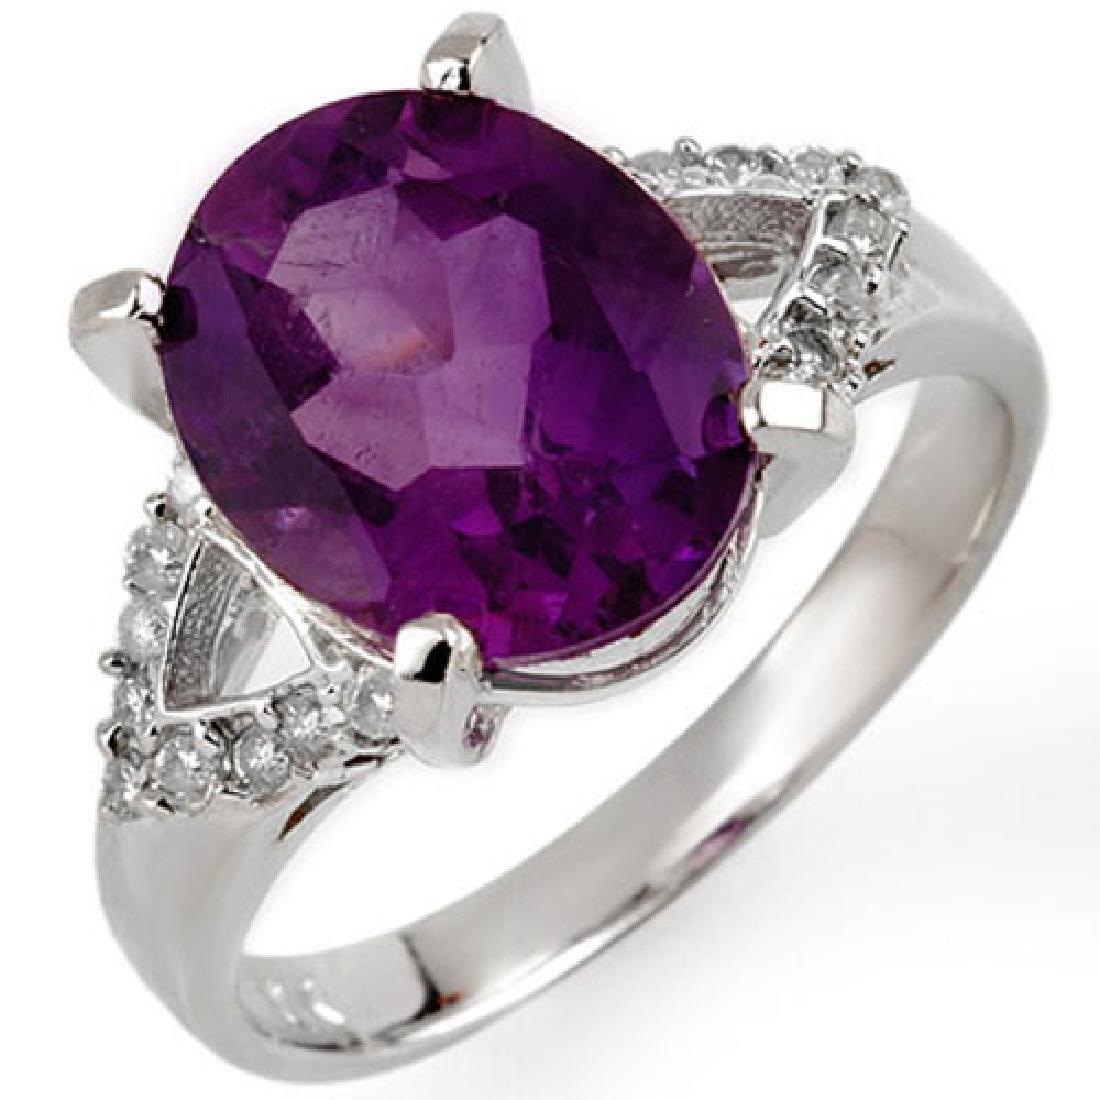 4.20 CTW Amethyst & Diamond Ring 10K White Gold